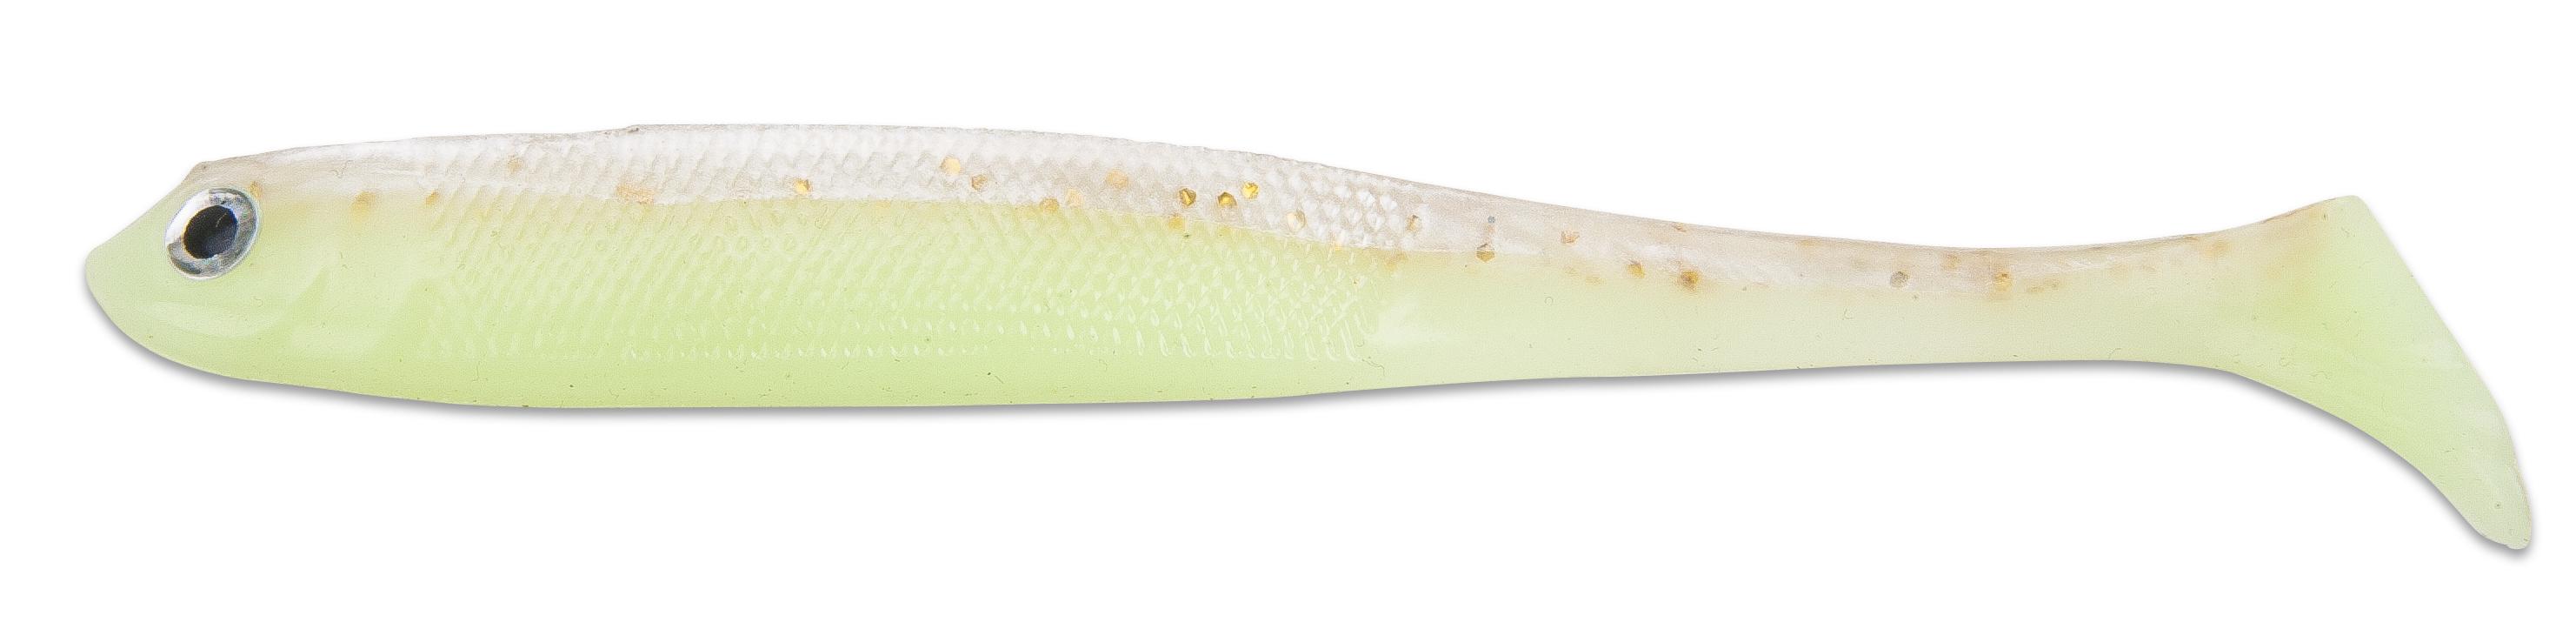 Iron Claw gumová nástraha Slim Jim 7 cm Vzor LU, 3ks